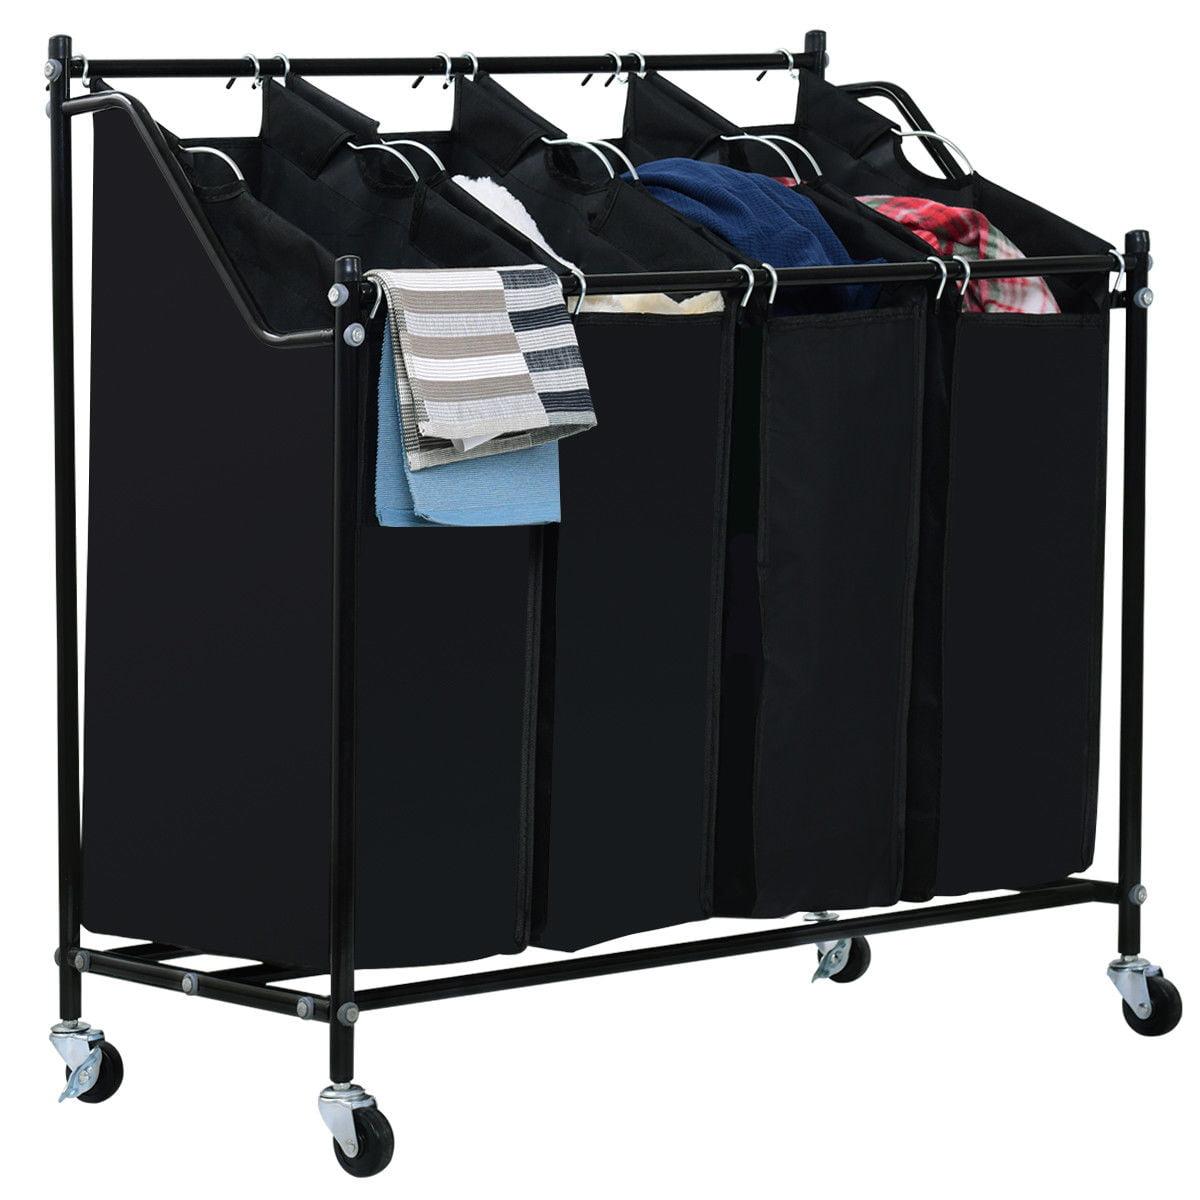 Costway 4 Bag Rolling Laundry Sorter Cart Hamper Organizer Compact Basket Heavy Duty by Costway